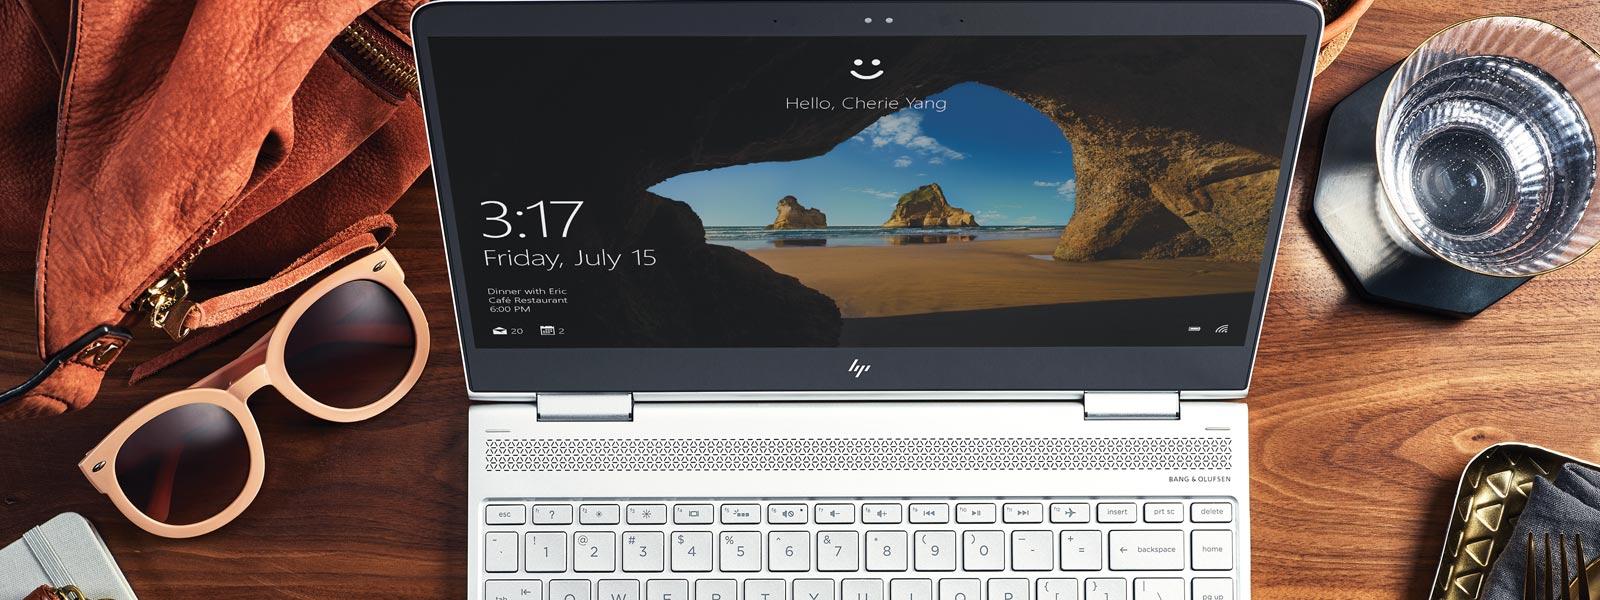 Vue plongeante d'un appareil Windows10 sur un bureau